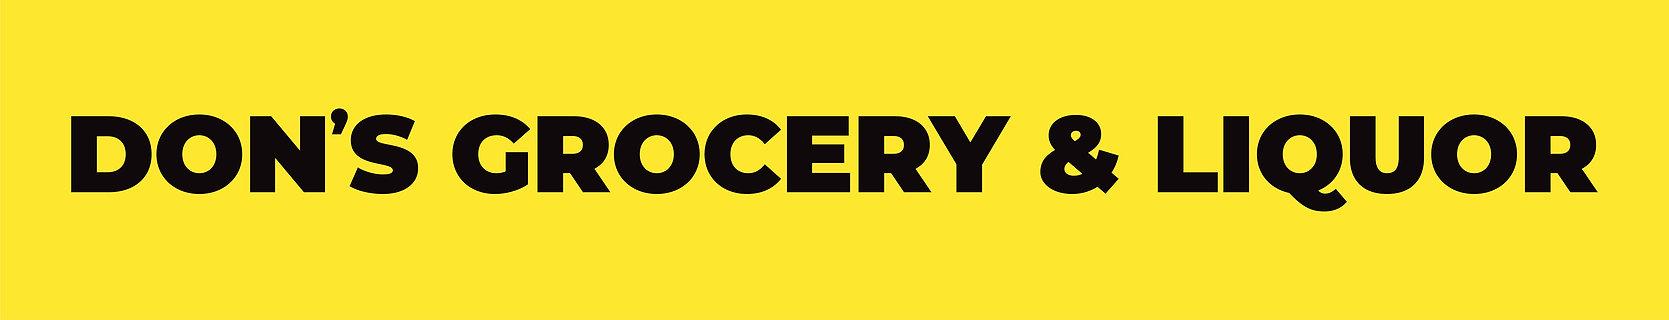 Don's Grocery & Liquor